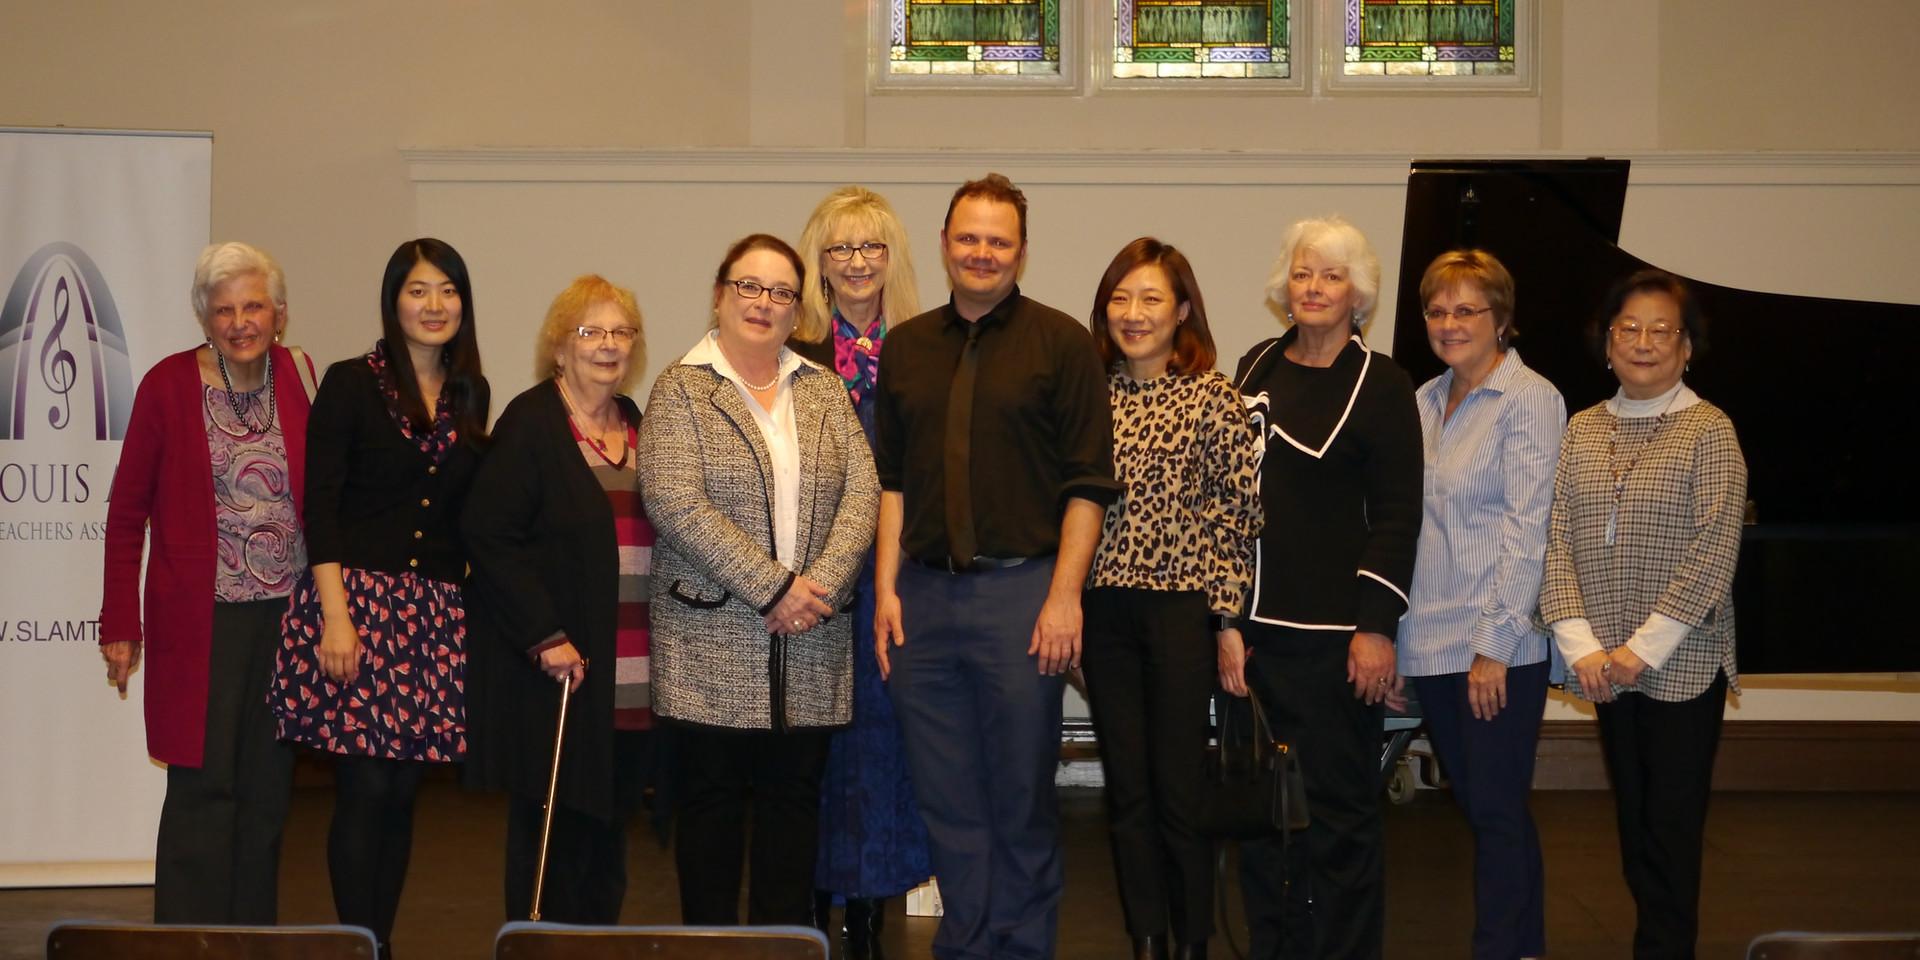 Legacy Fund Concert: Guest Artist with SLAMTA Teachers